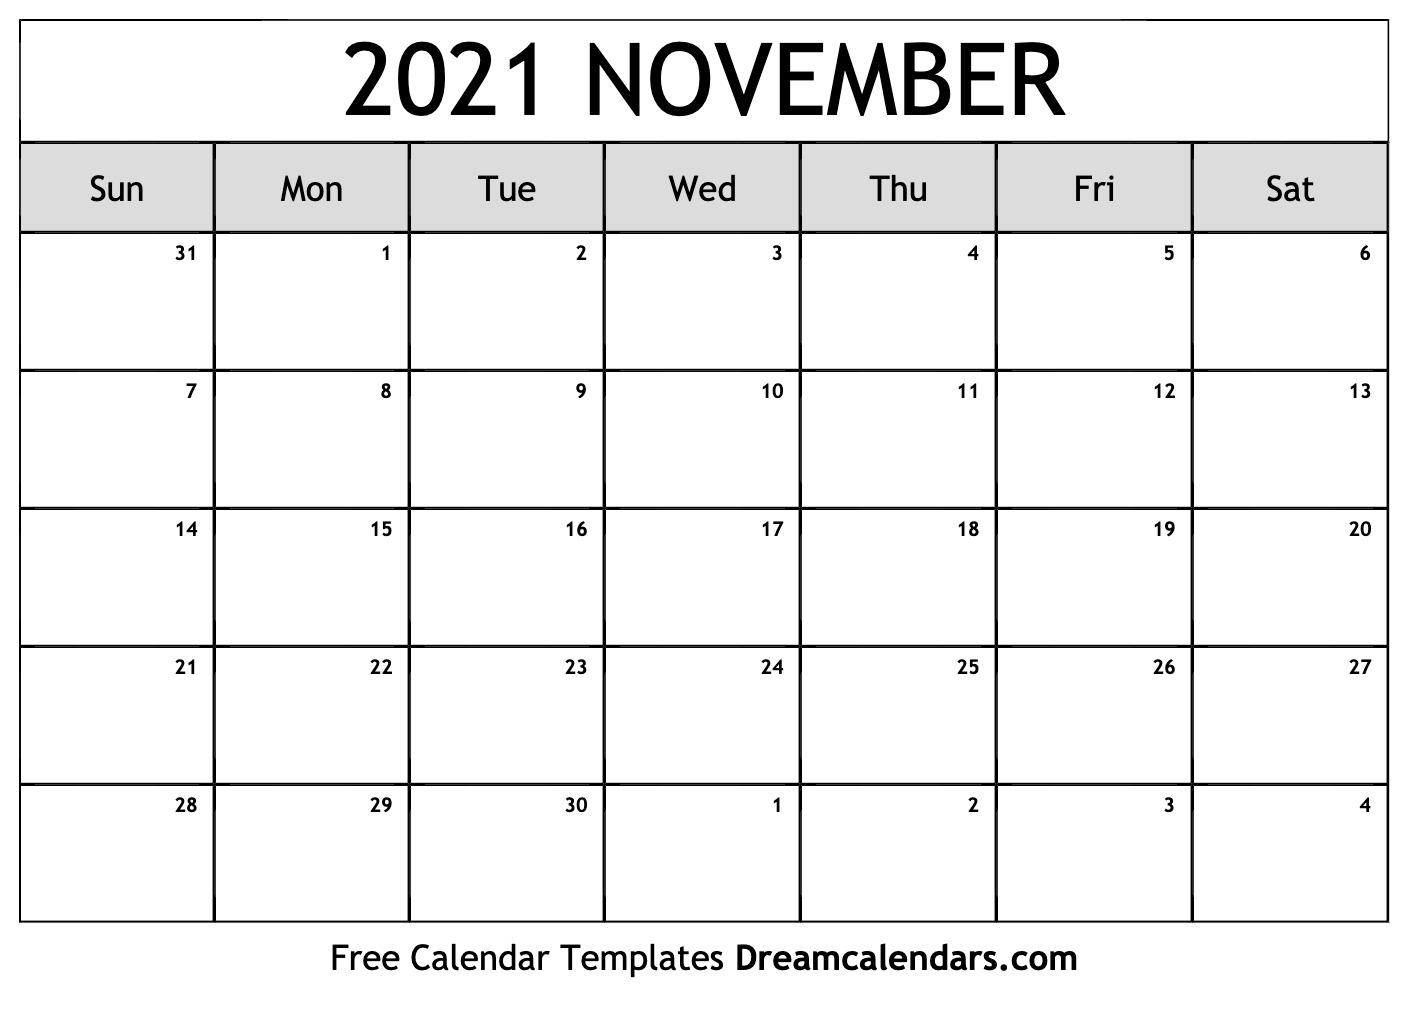 November 2021 Calendar | Free Blank Printable Templates